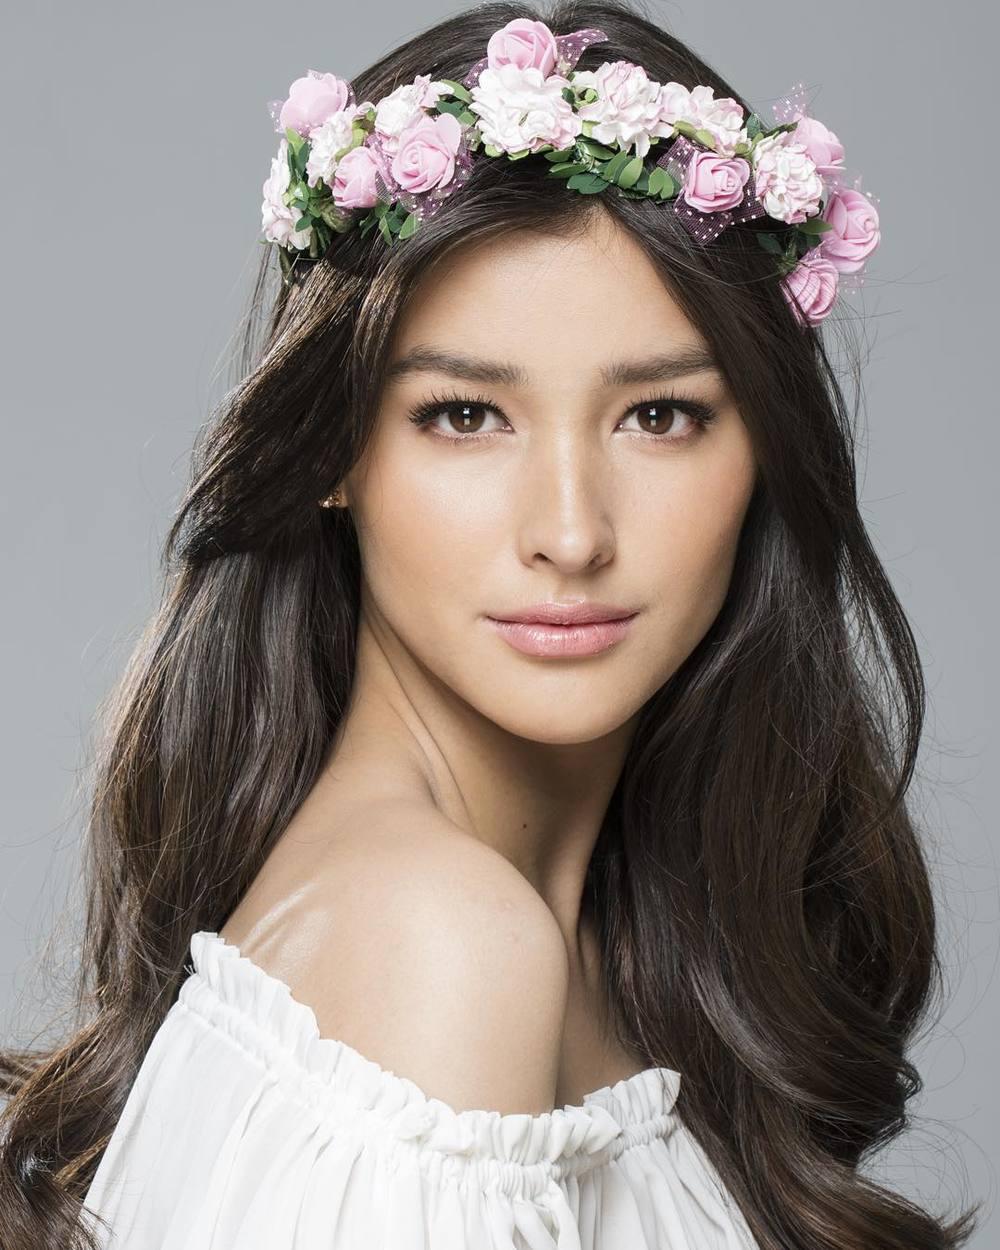 Filipino actress Liza Soberano (Image via wethepvblic.com)